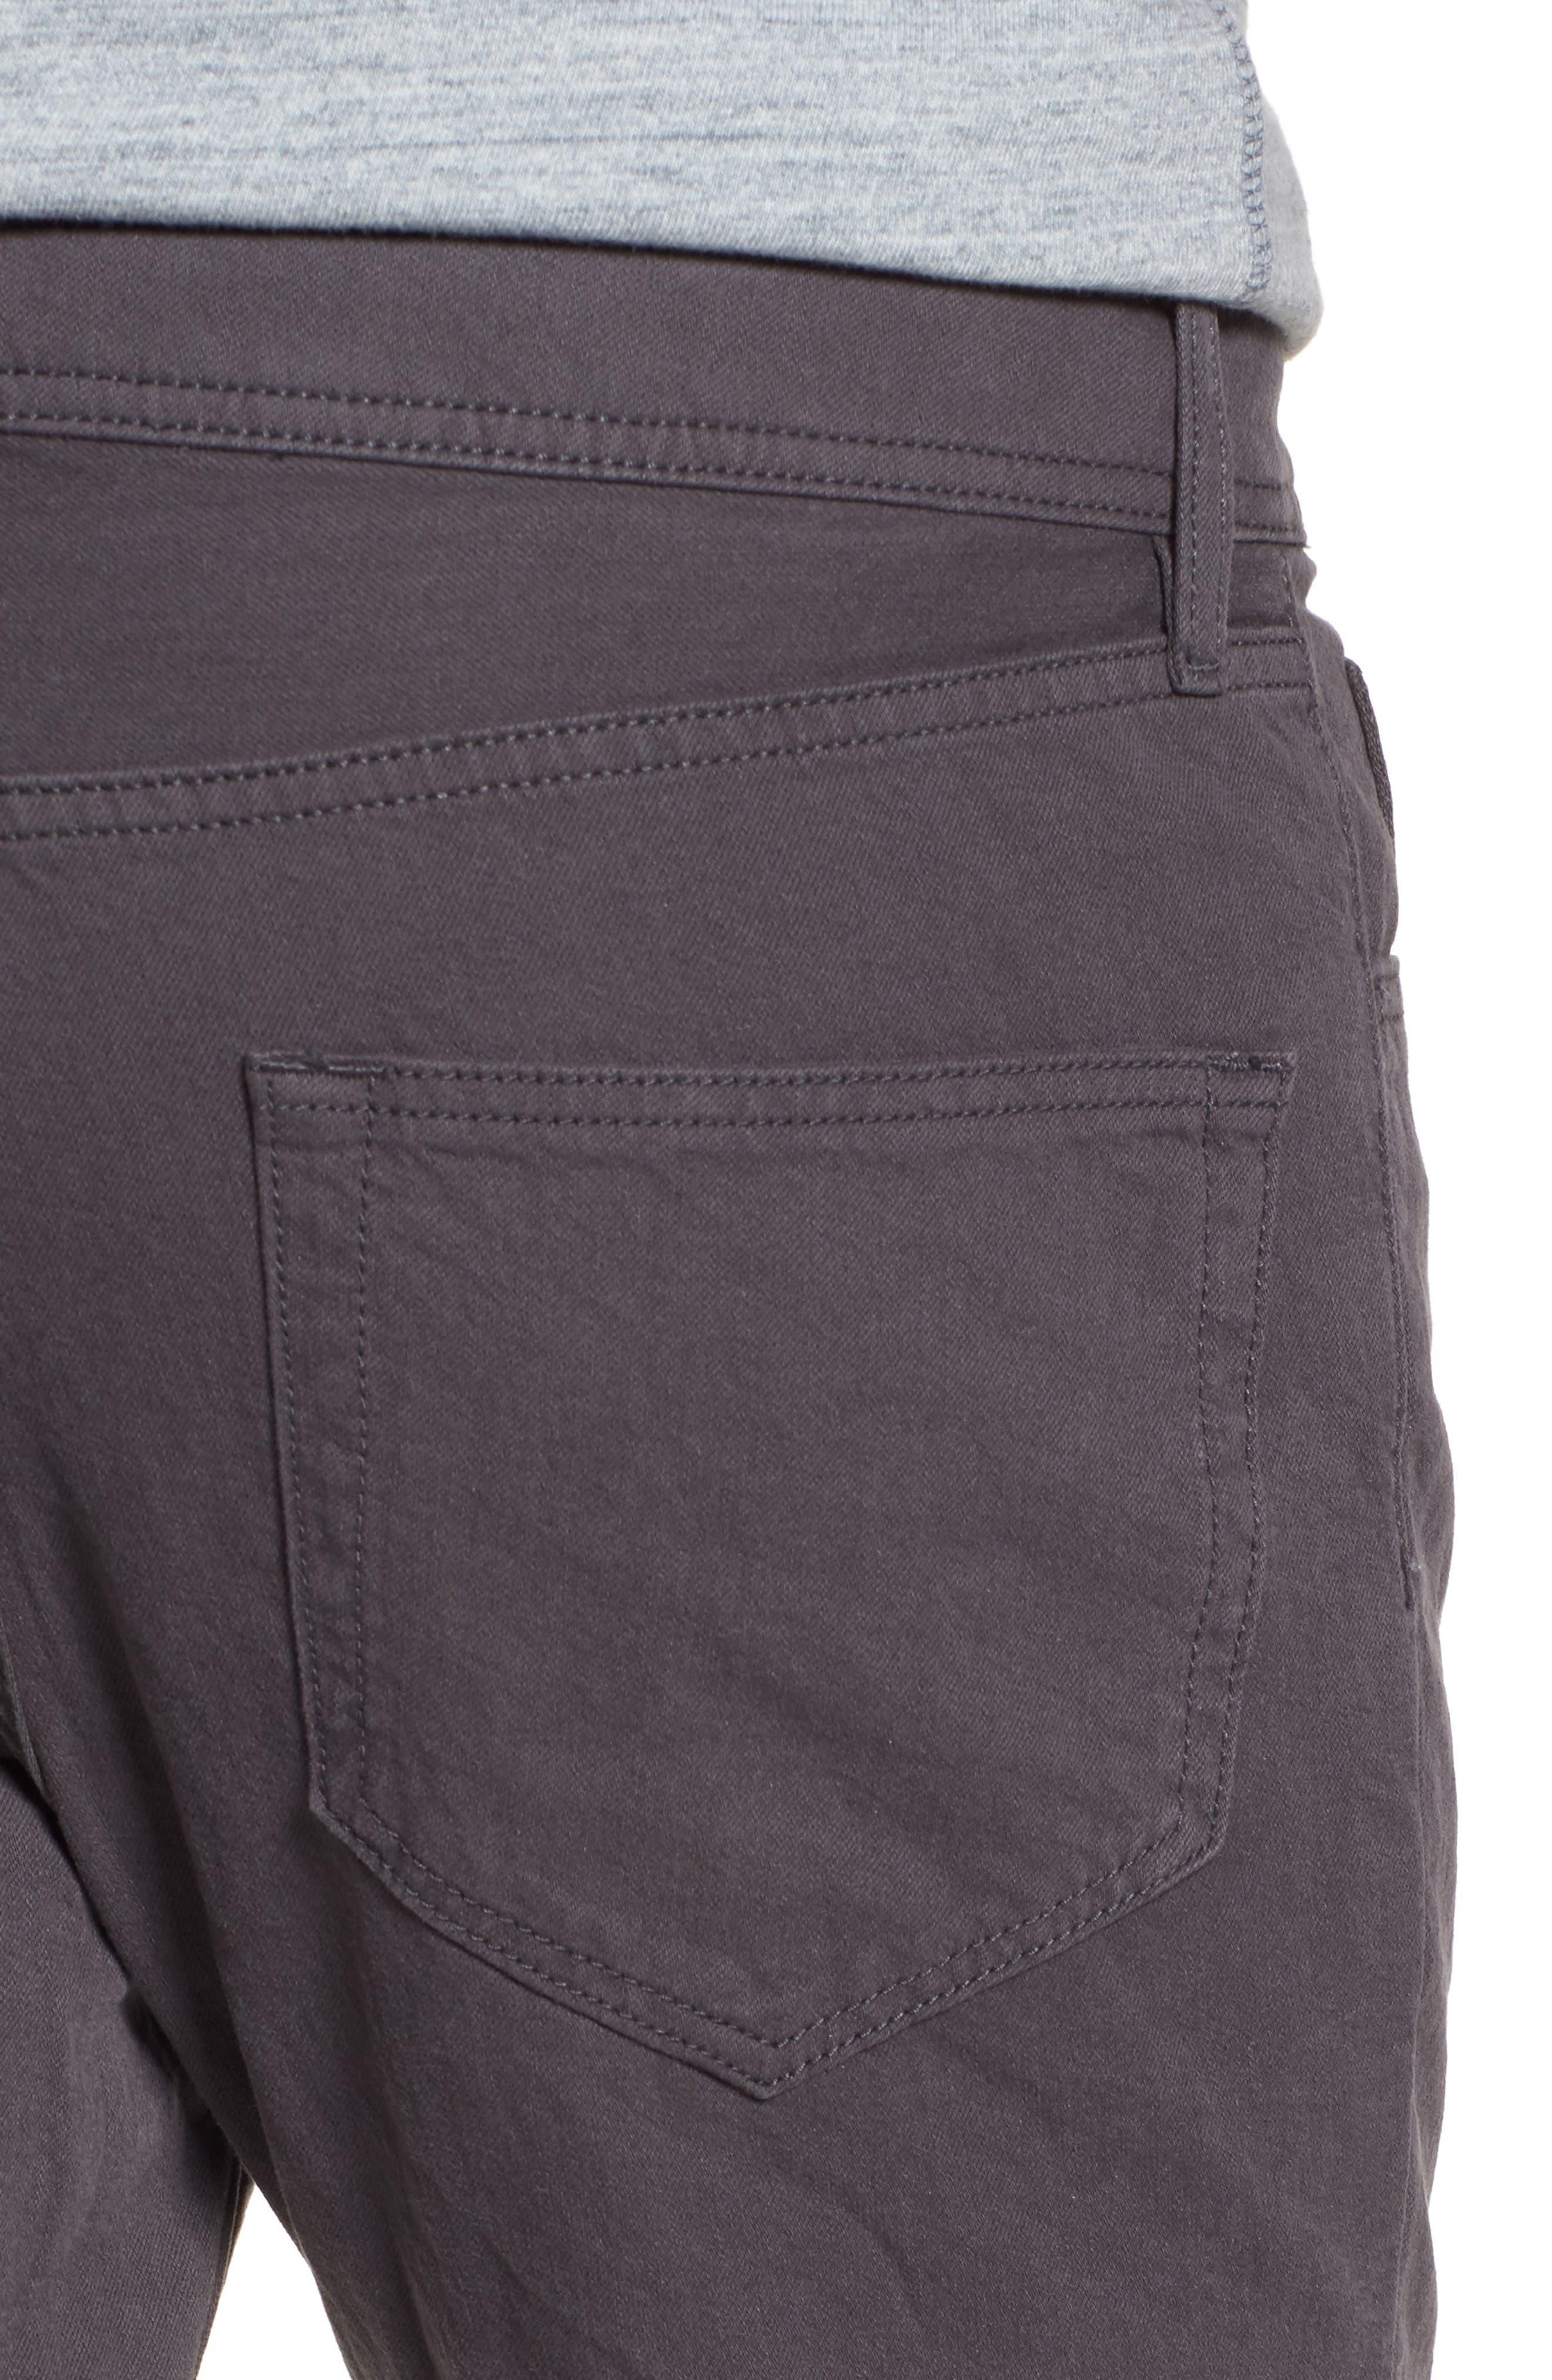 Slim Fit Twill Pants,                             Alternate thumbnail 5, color,                             037